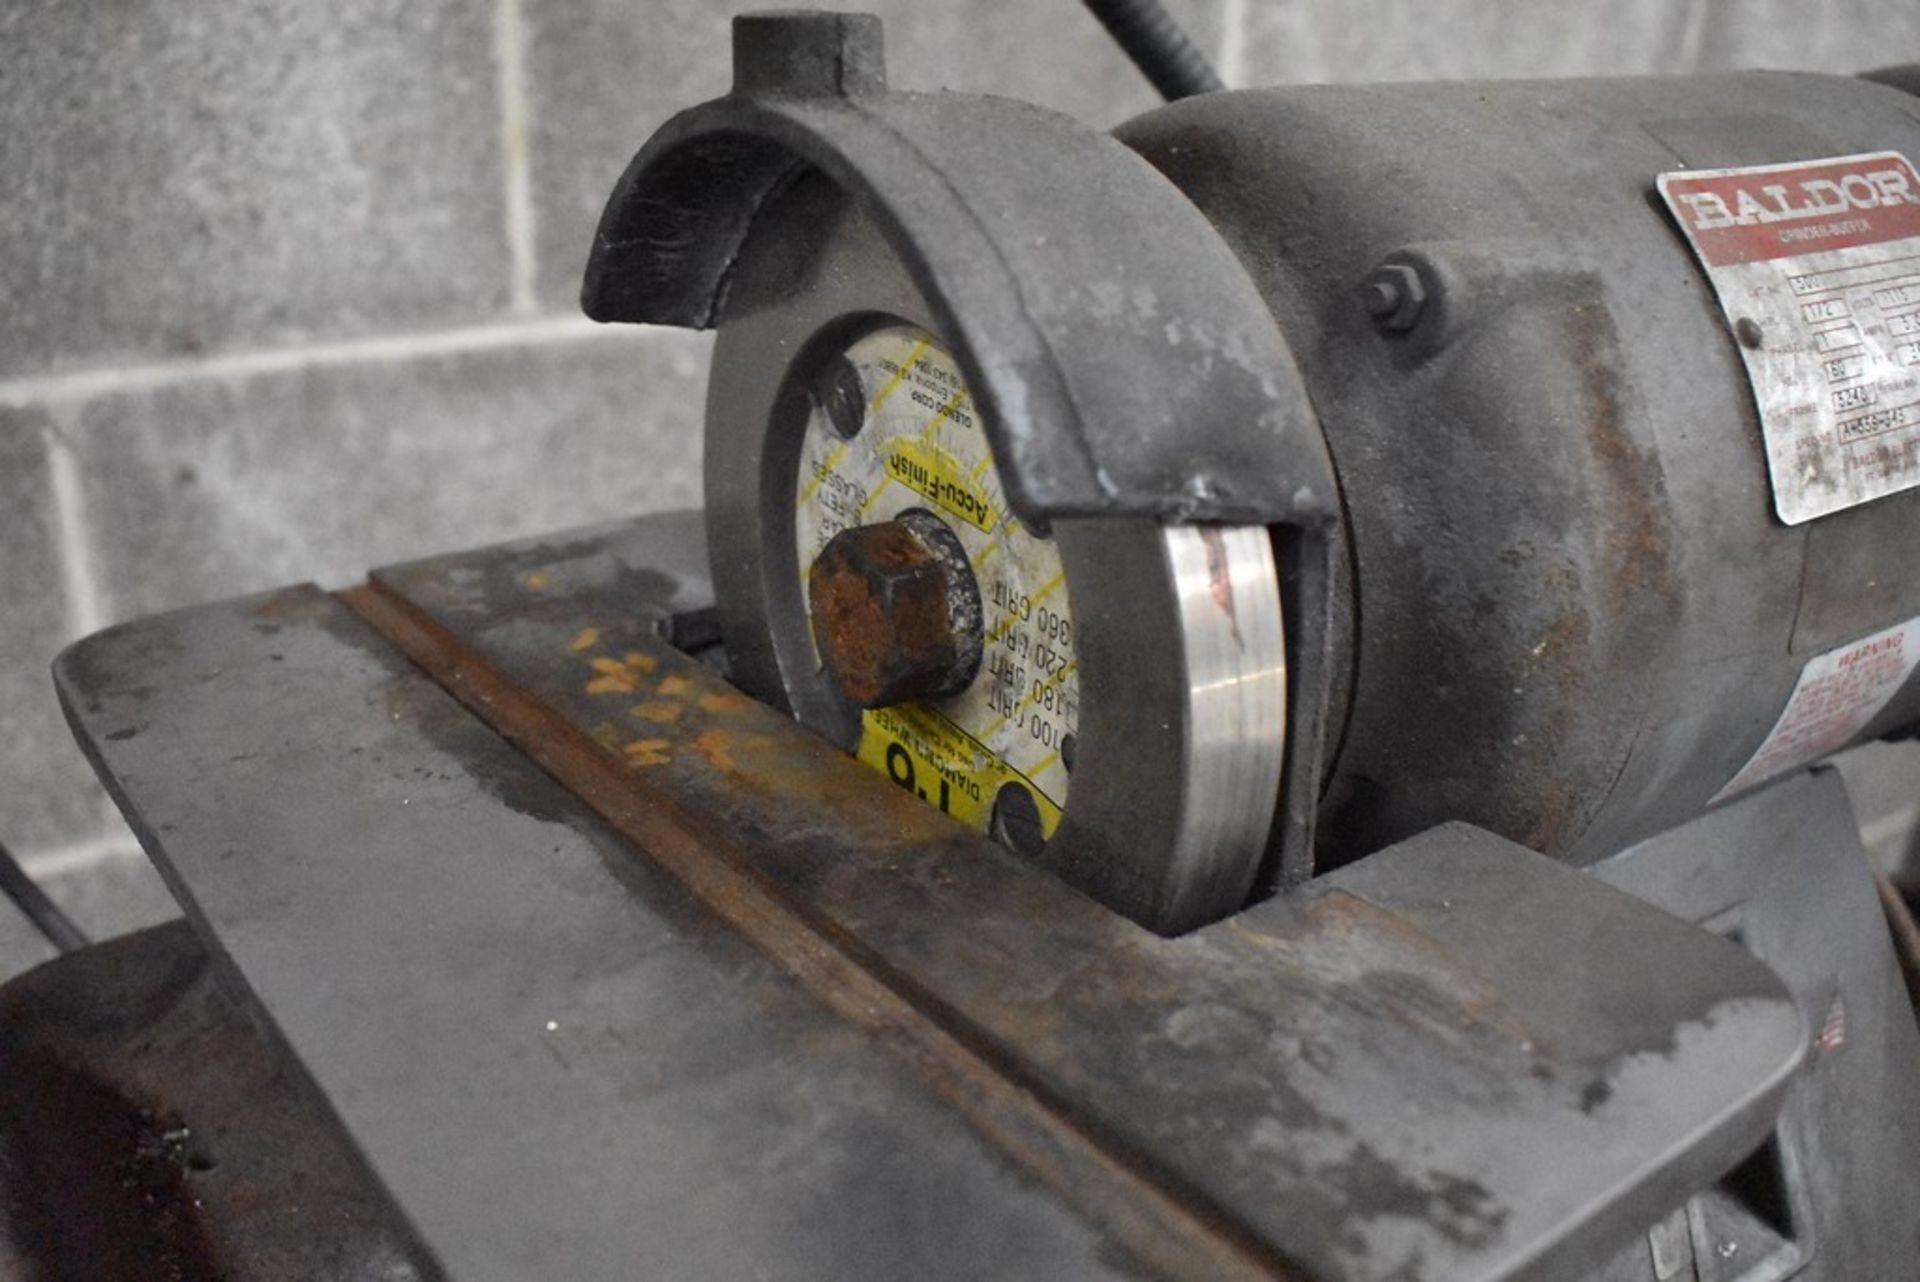 BALDOR ½ HP PEDESTAL DOUBLE END CARBIDE TOOL GRINDER, S/N A-559-343 - Image 3 of 7